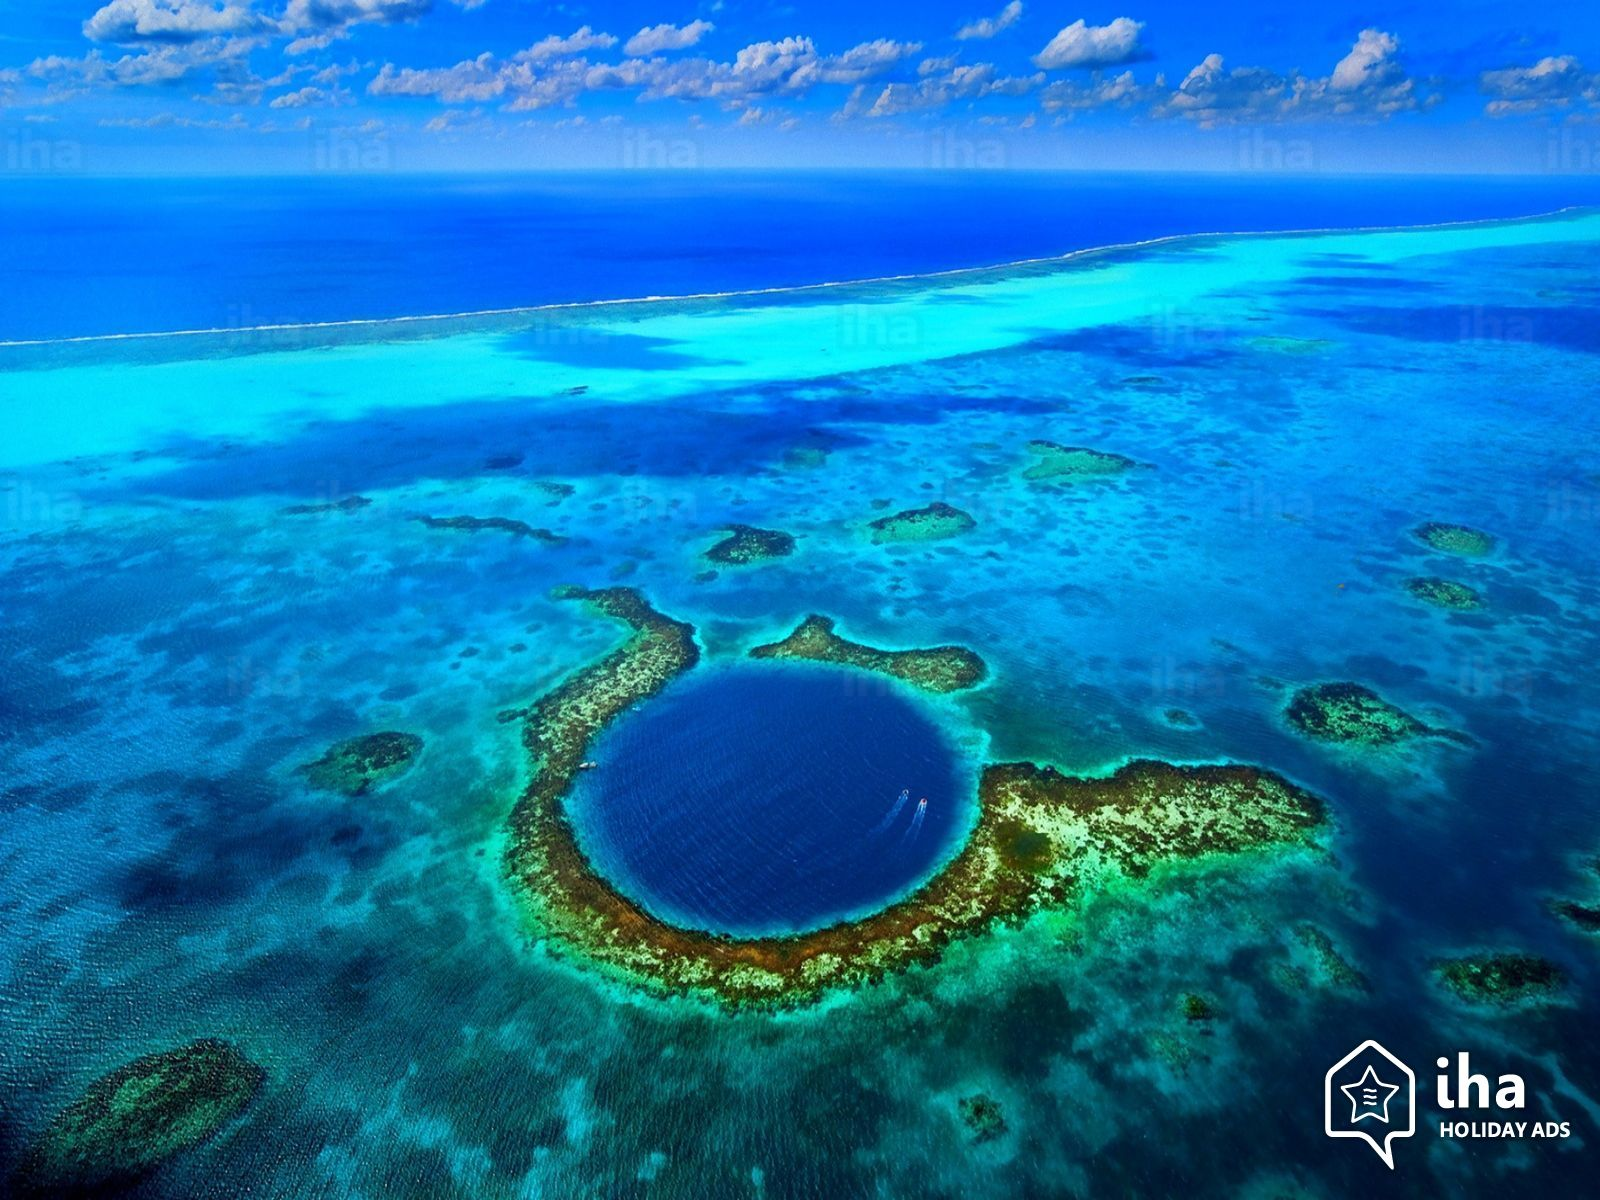 10 fenomene uimitoare de pe Terra, Marea Gaura Albastra, Belize